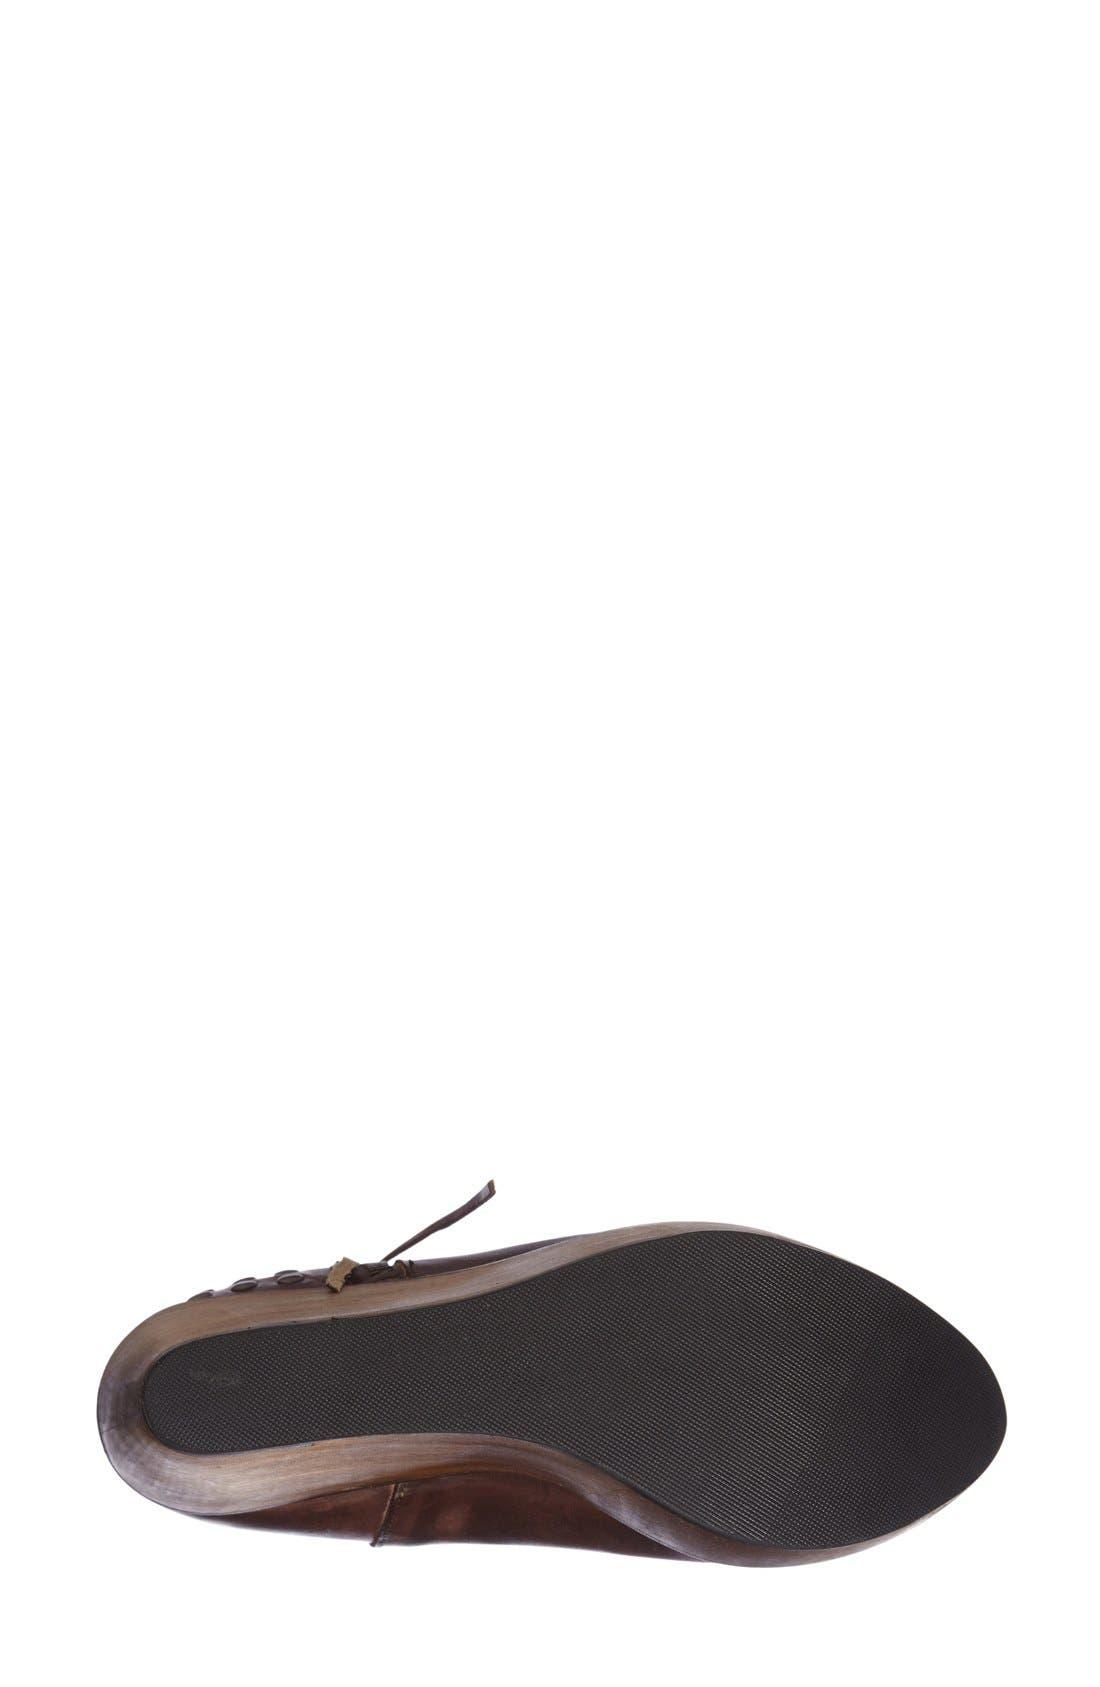 Alternate Image 4  - Bed Stu 'Ghent' Wedge Platform Bootie